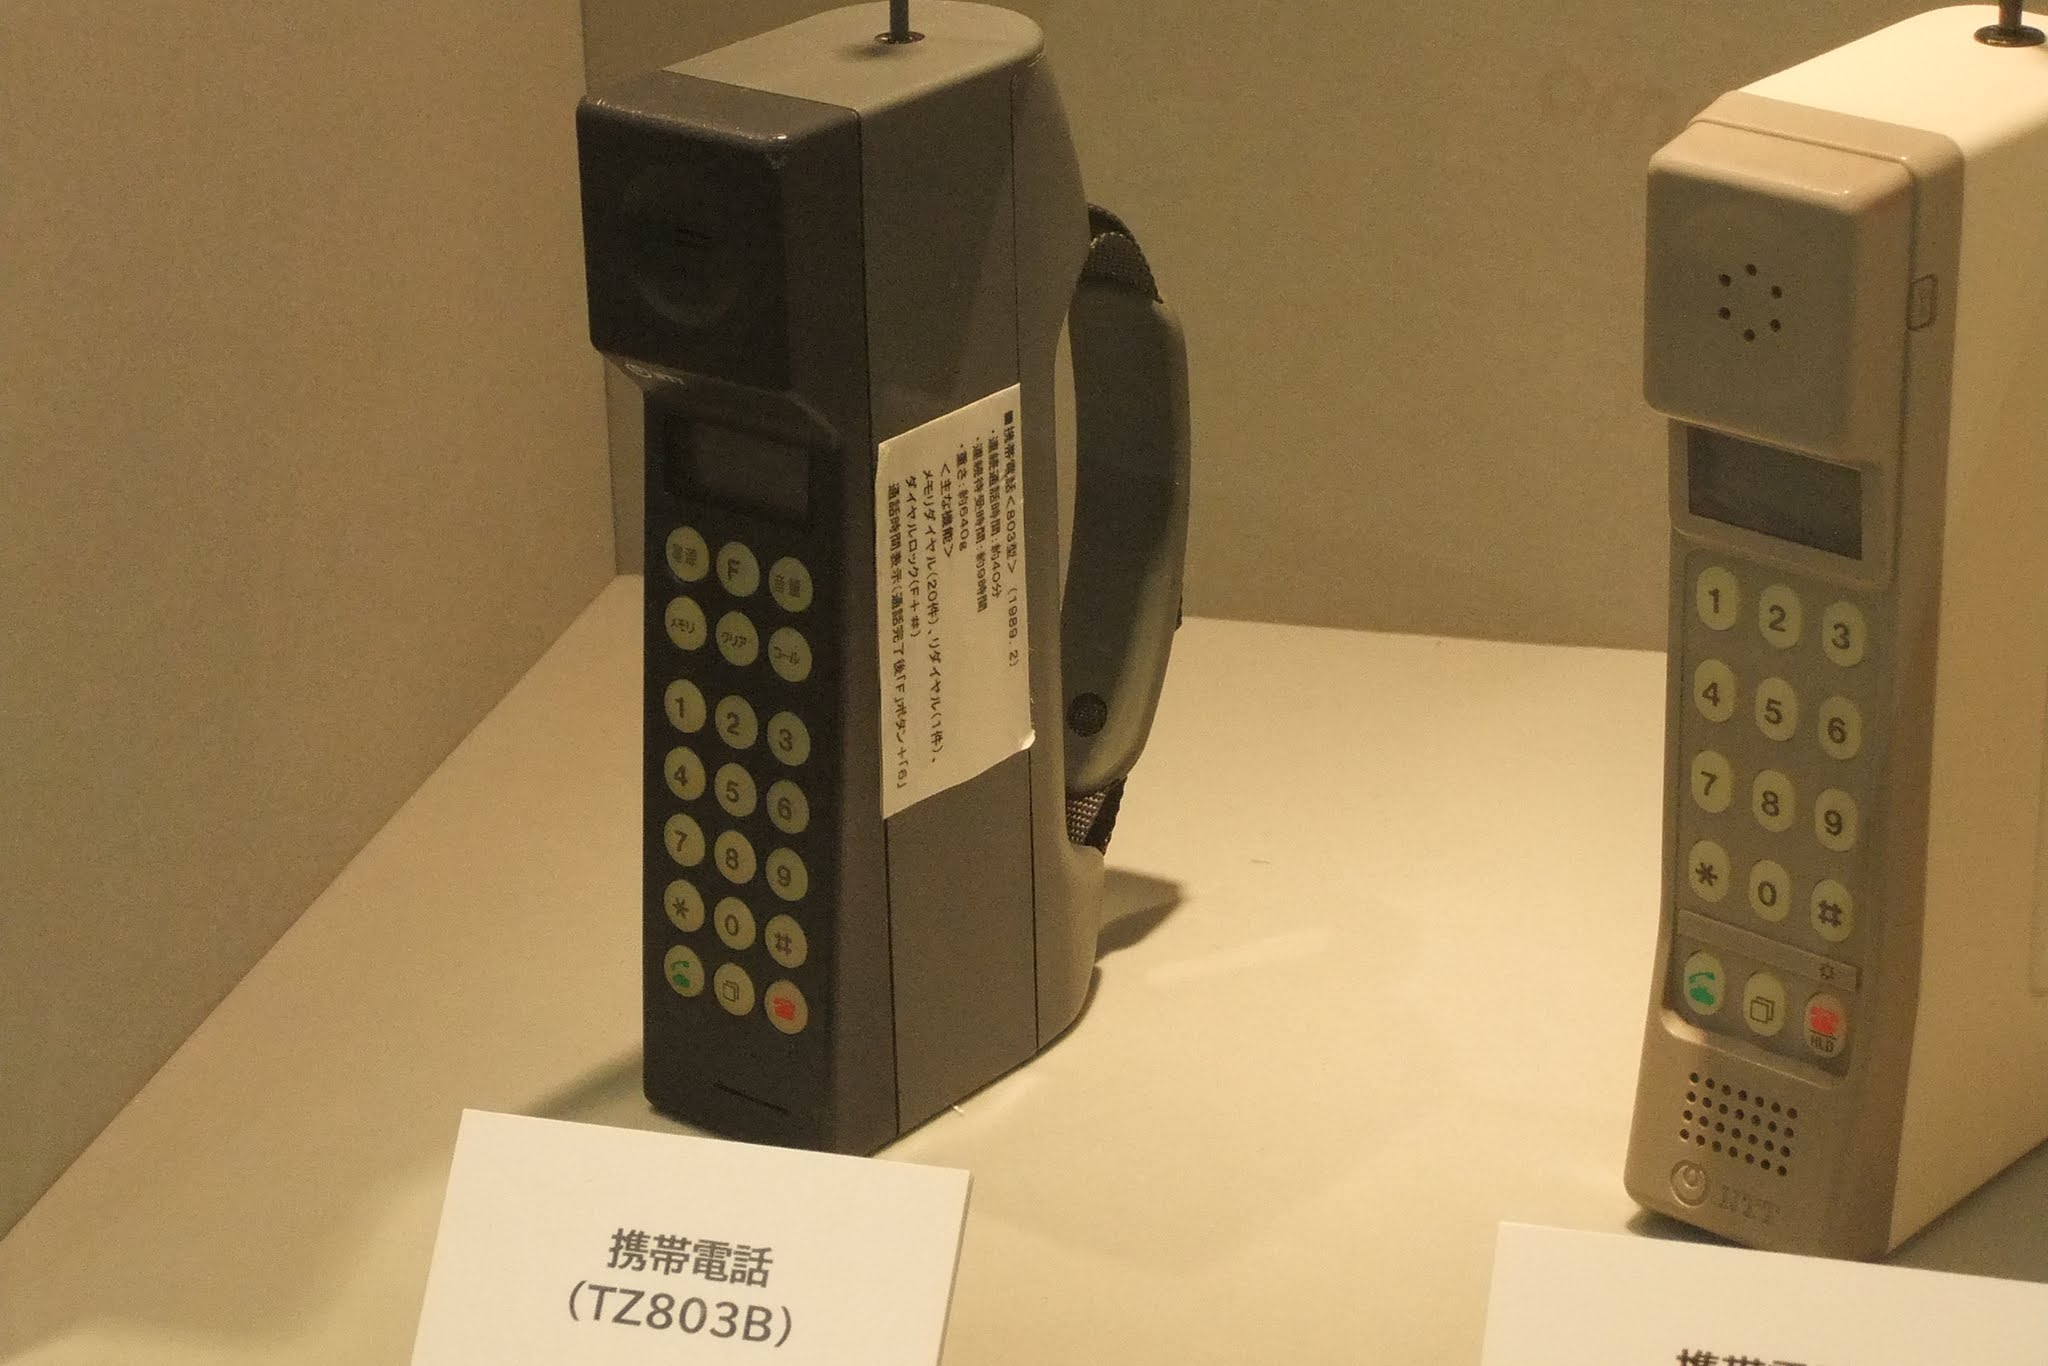 docomo-TZ803B-old-mobilephone ドコモの初期型携帯電話